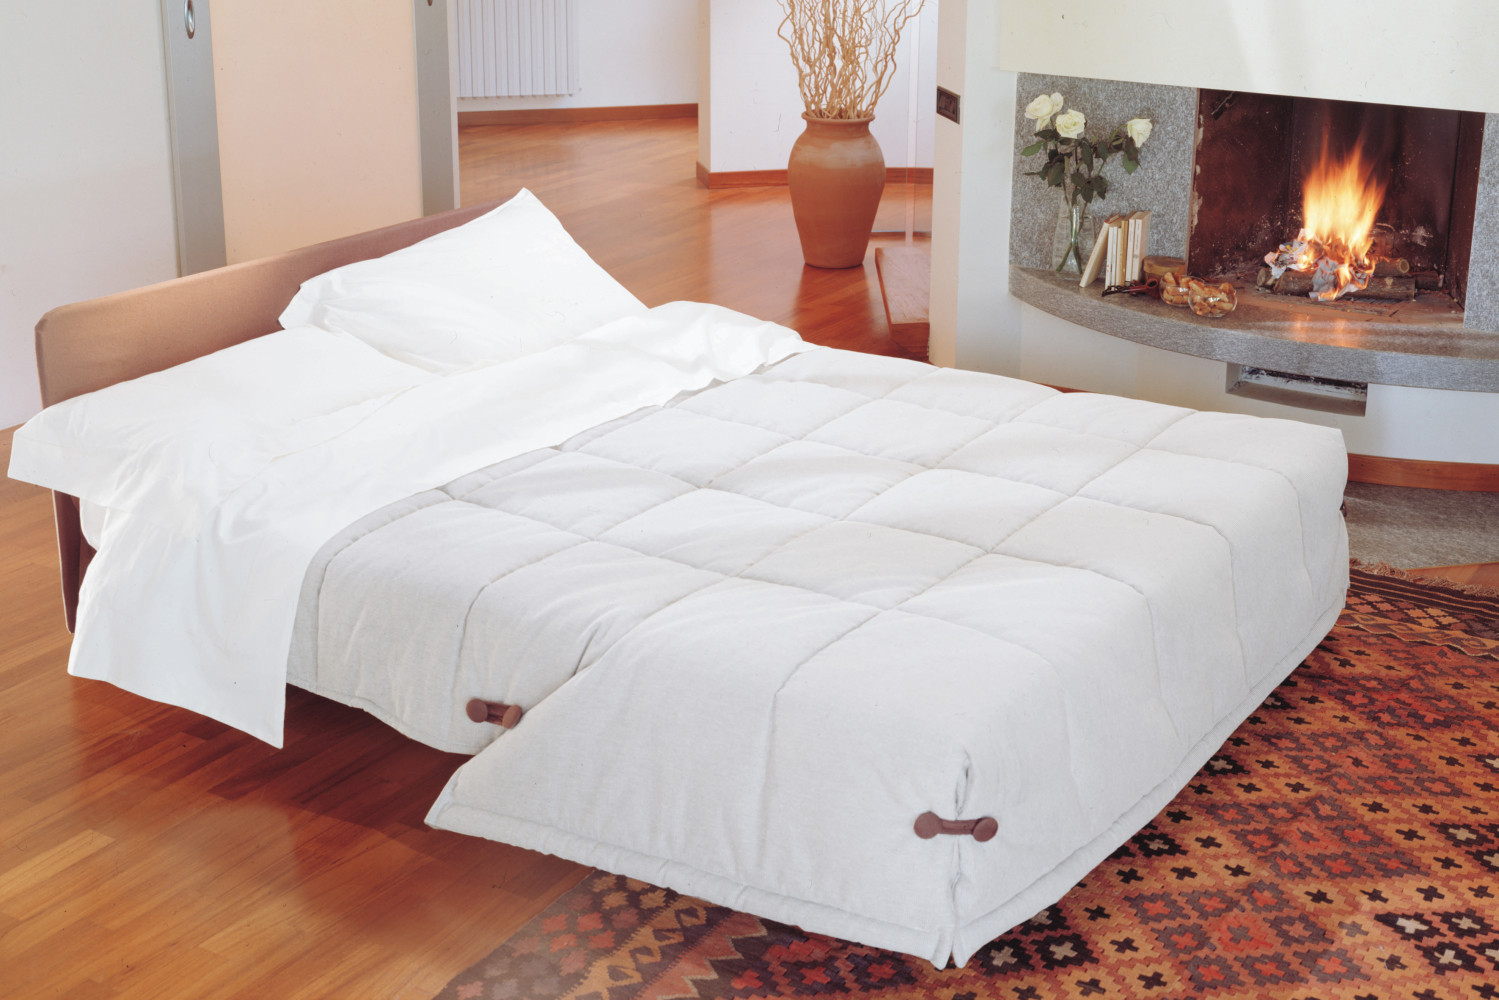 canap bz rapido avec couette int gr e ginger. Black Bedroom Furniture Sets. Home Design Ideas